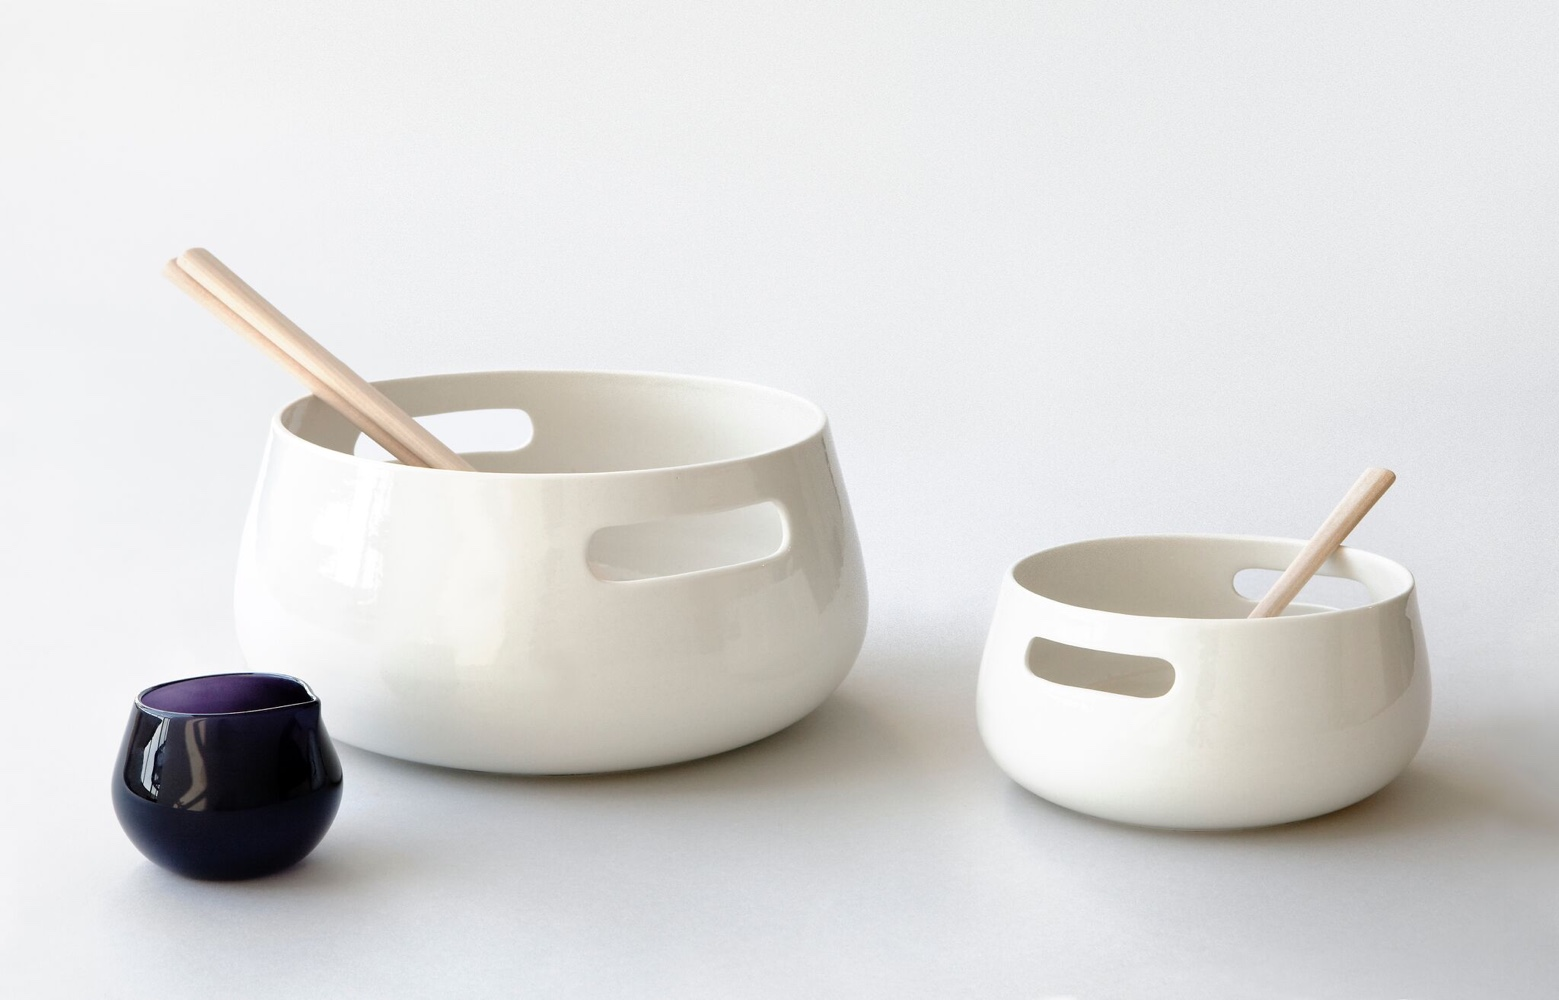 KOLMIKKO tableware by Maiju Uski.Photo by Chikako Harada courtesy ofMaiju Uski.